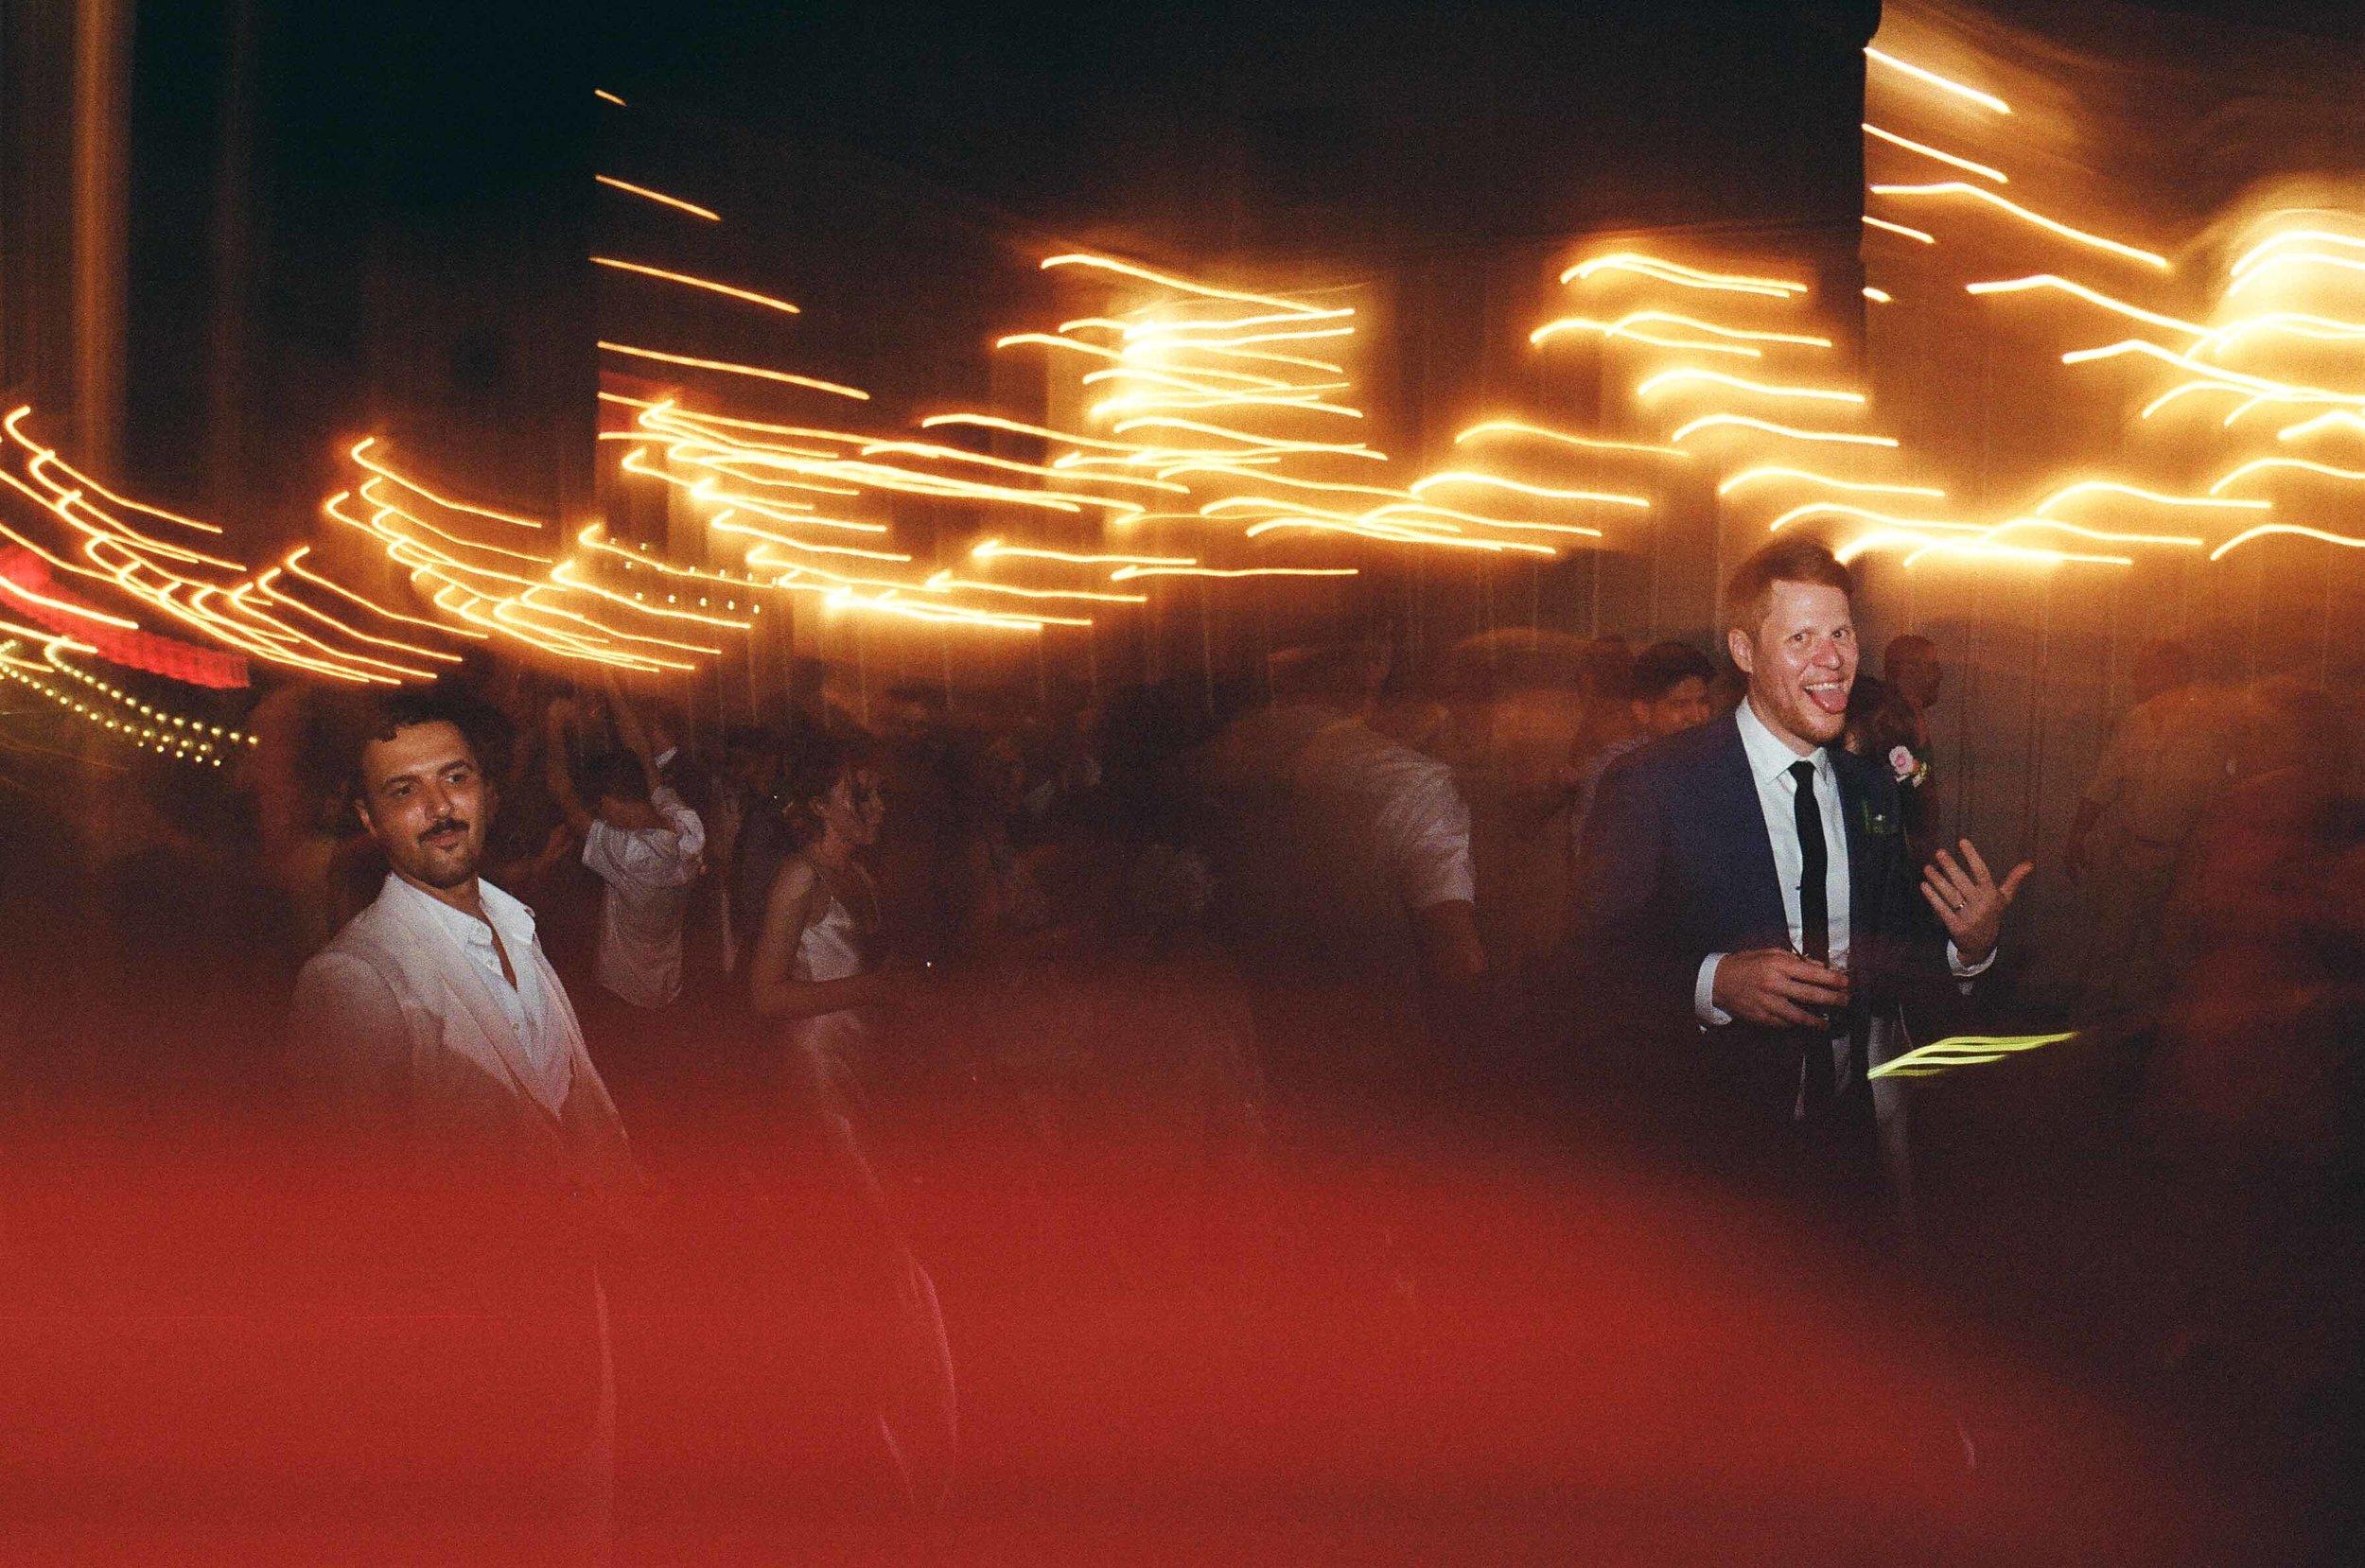 35mm_Film_Wedding_Photographer_Chellise_Michael_Photography-25.jpg